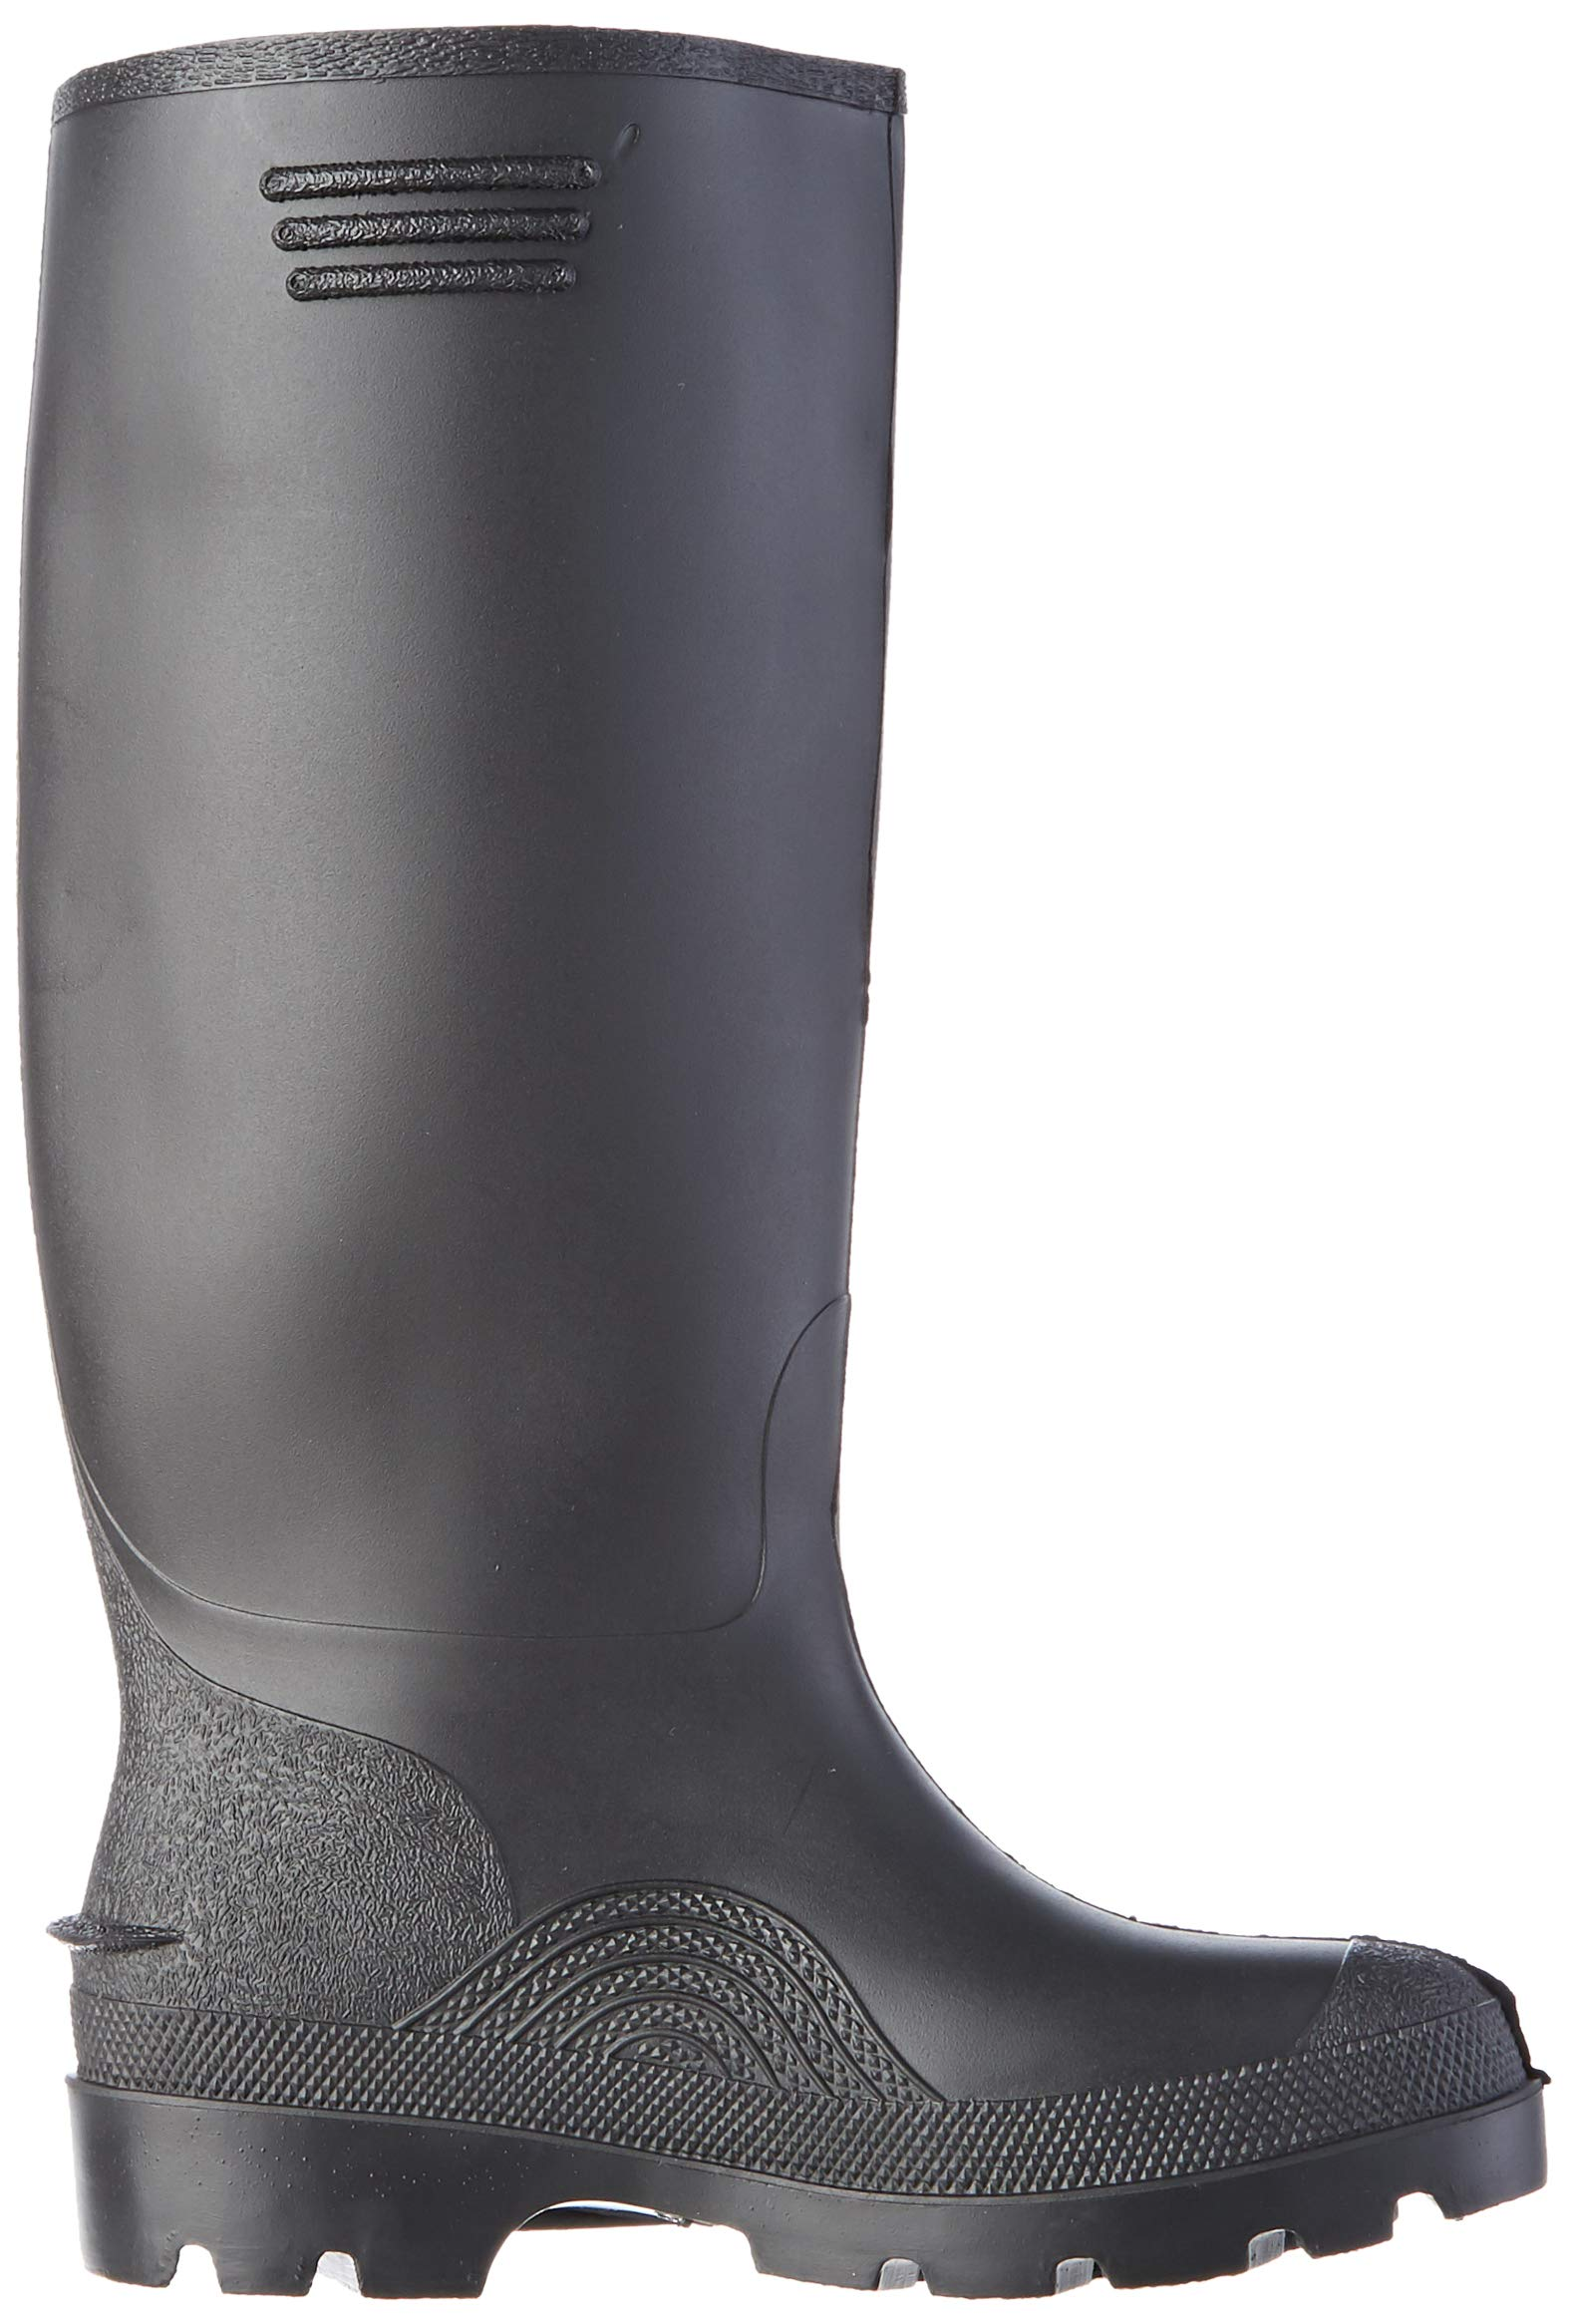 Dunlop Pricemastor PVC Welly / Mens Boots (8 UK) (Black) 6